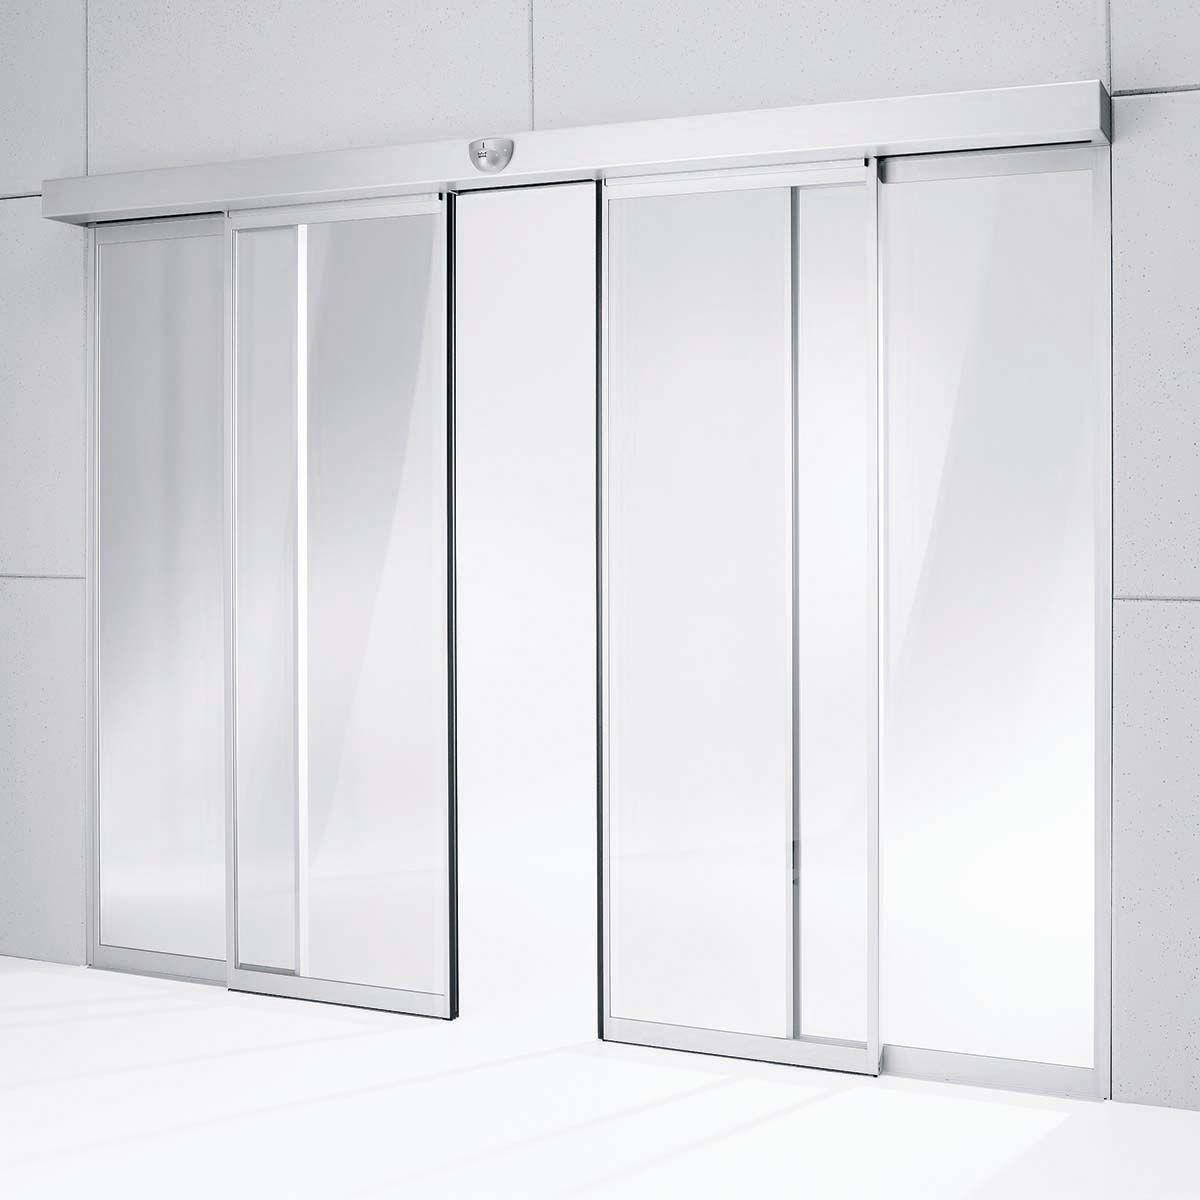 Dorma Automatic Sliding Door Es200 Automatic Sliding Doors Automatic Door Sliding Doors